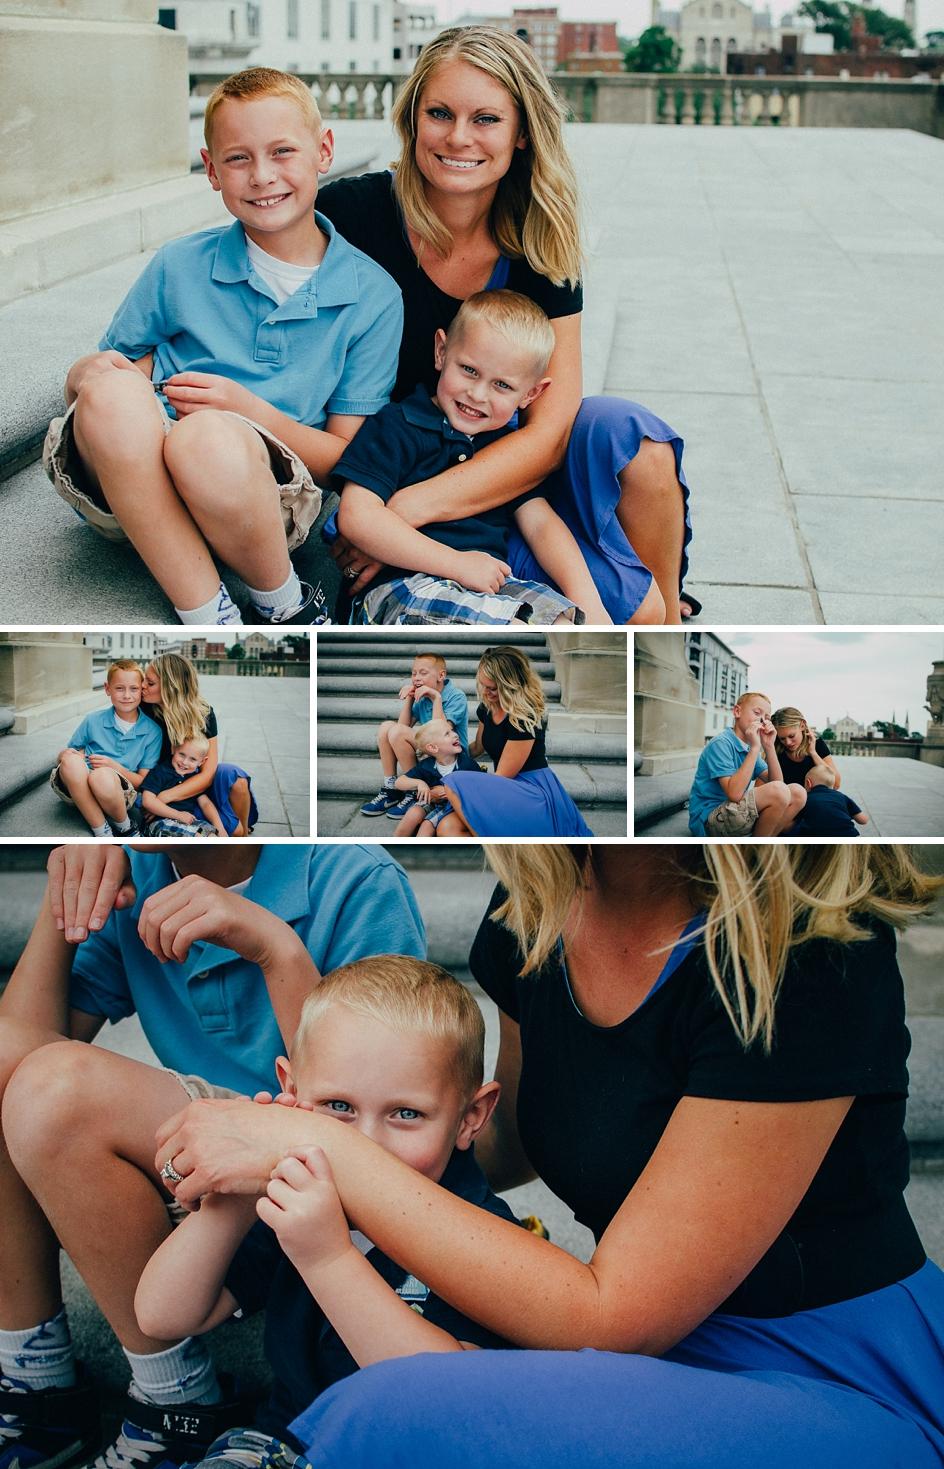 indianapolis-family-photographer_0002.jpg